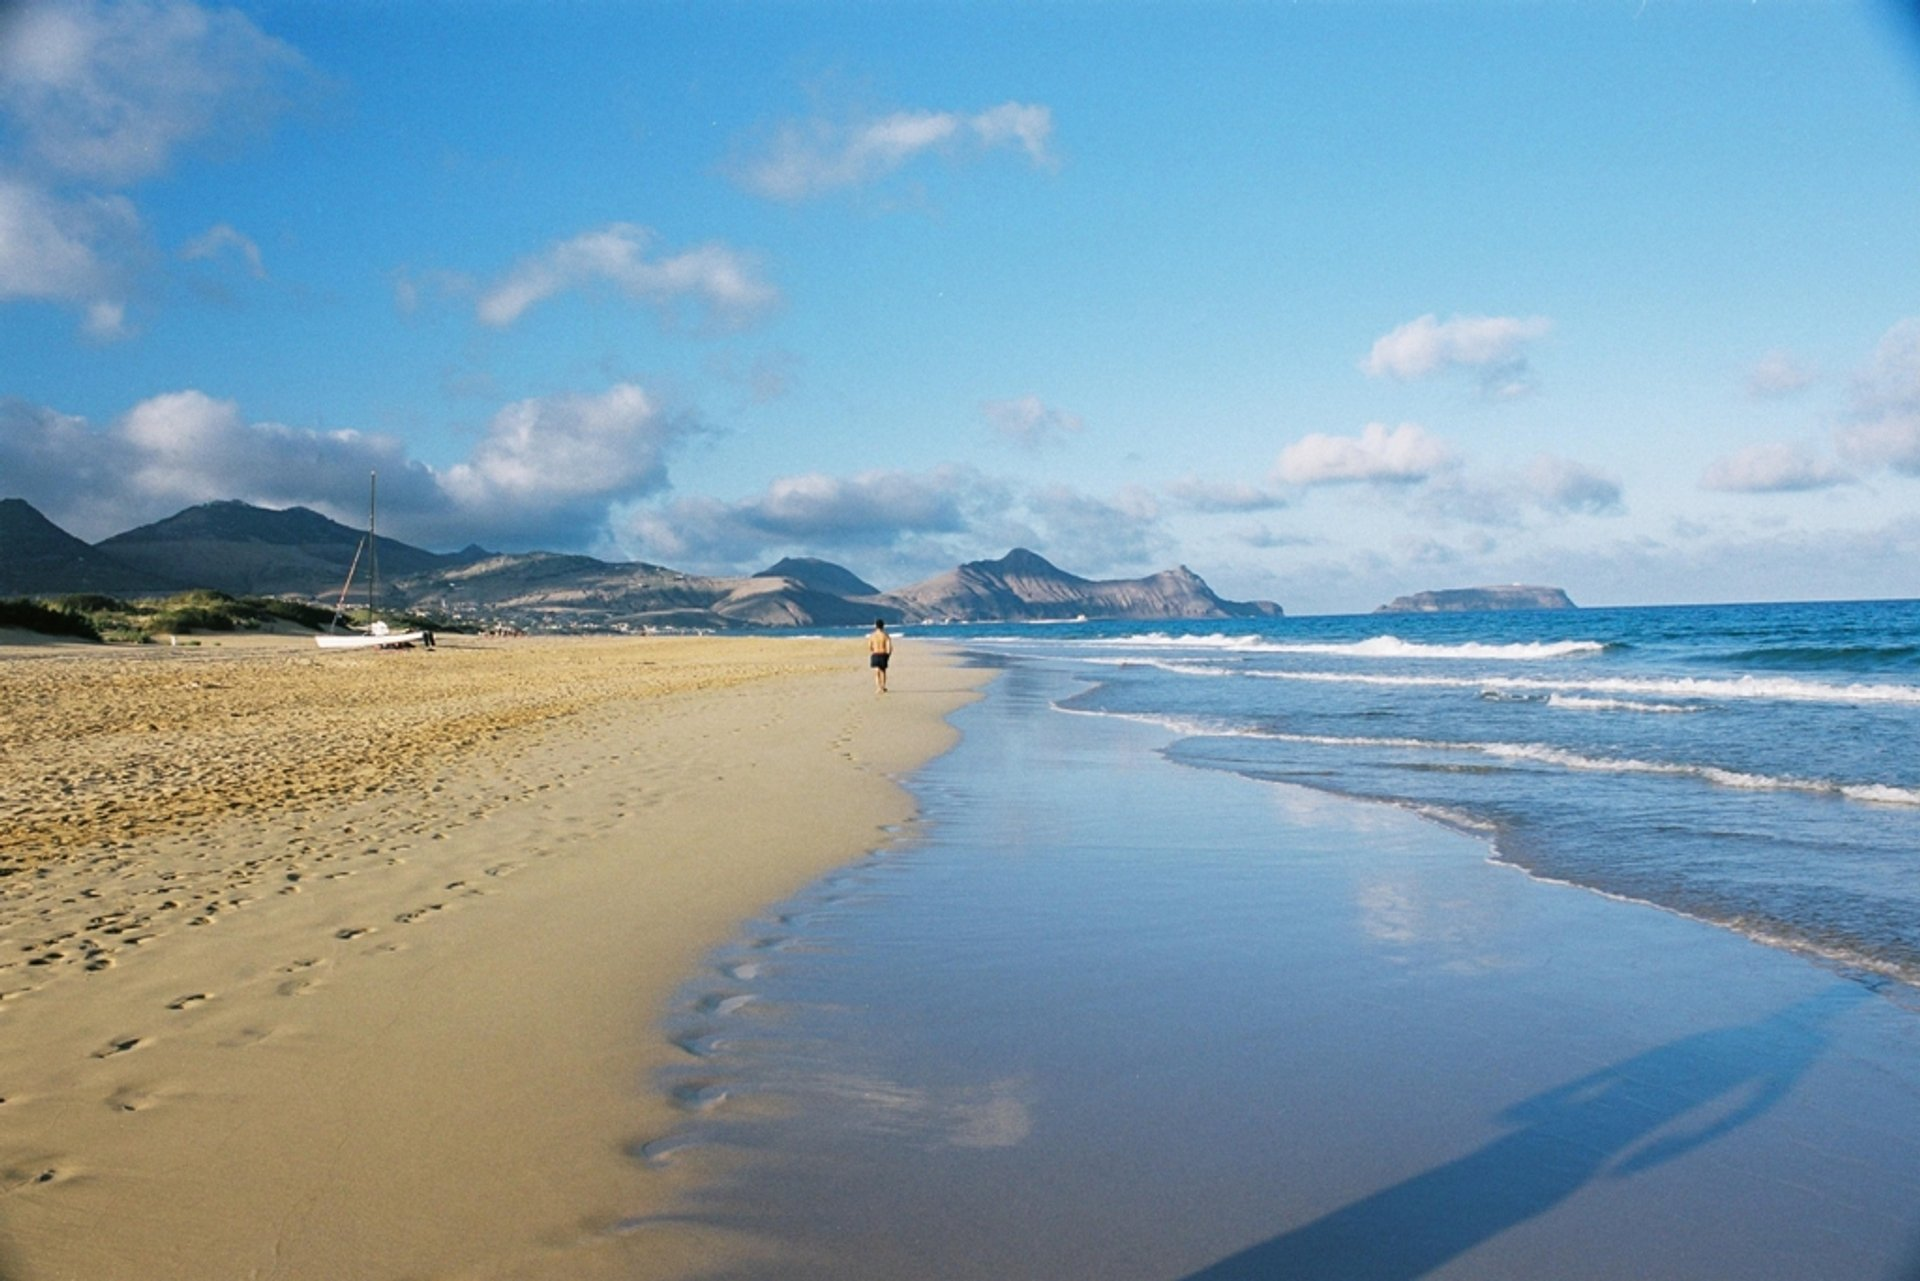 Beach Season in Madeira 2020 - Best Time